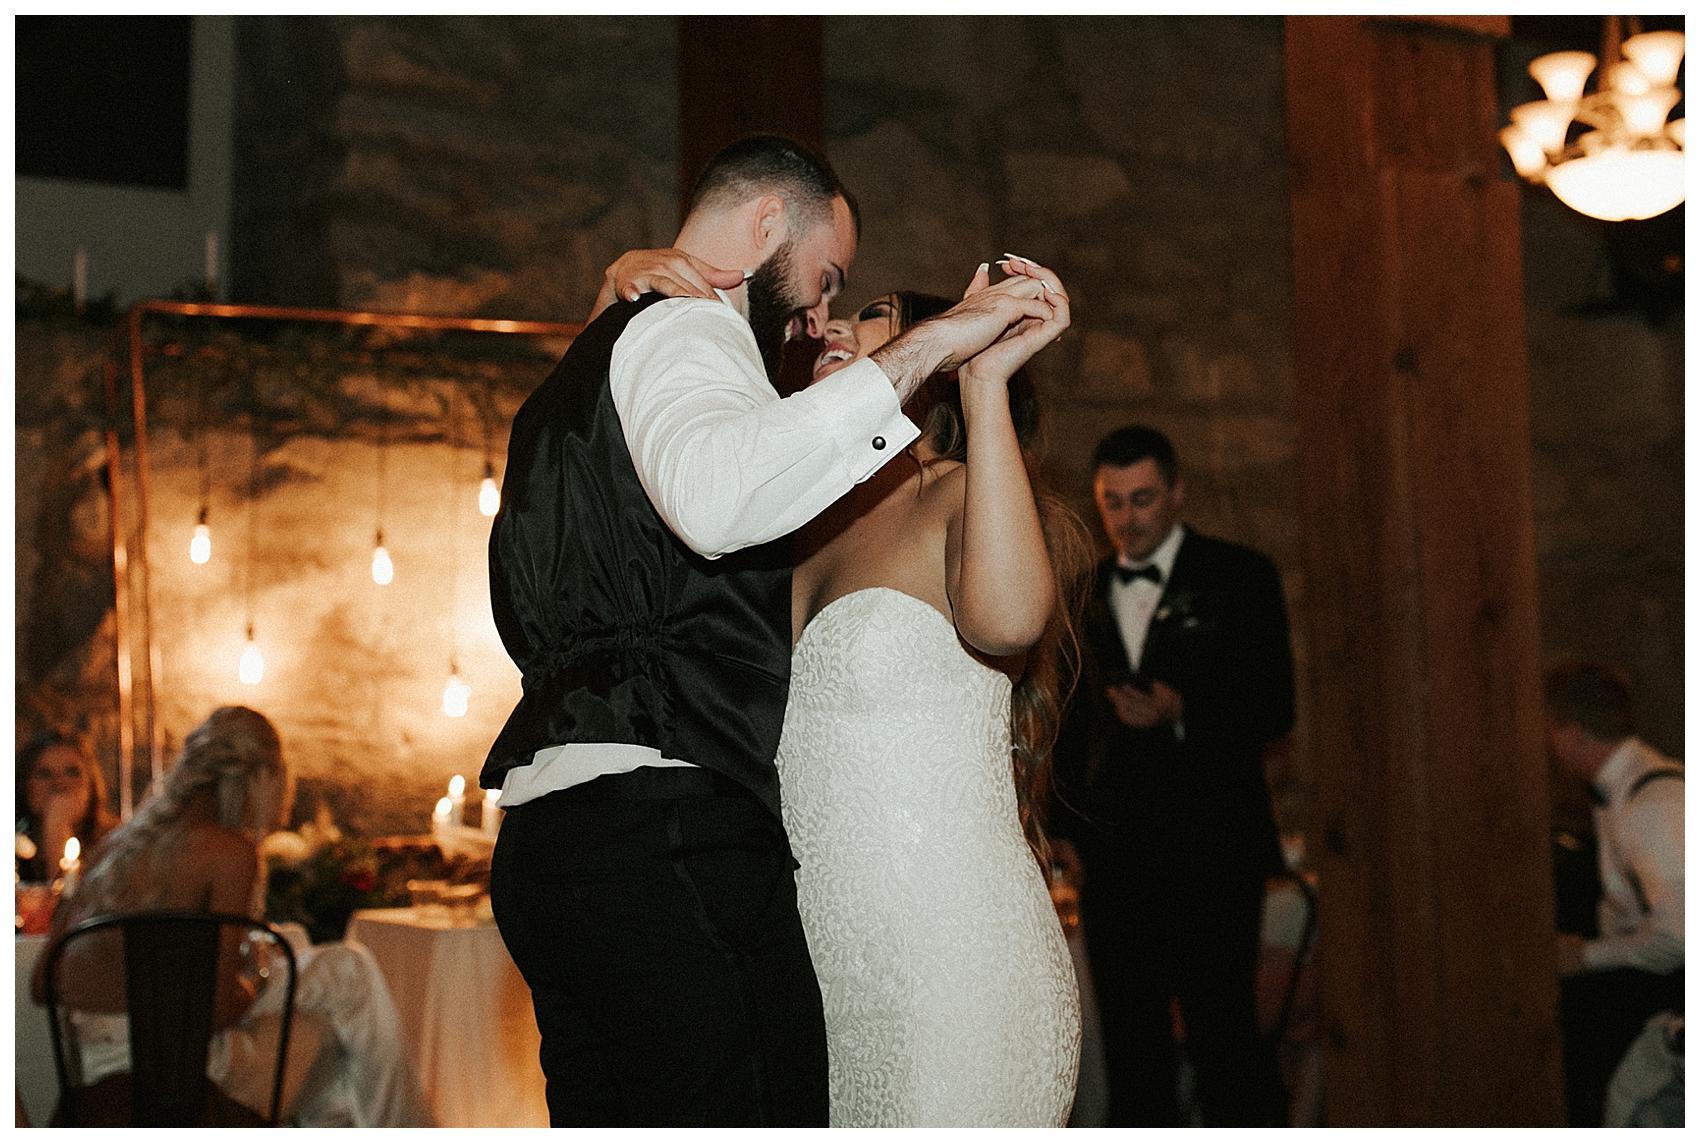 Chateau Rive Spokane Wedding Cassie Trottier Photography01115.jpg